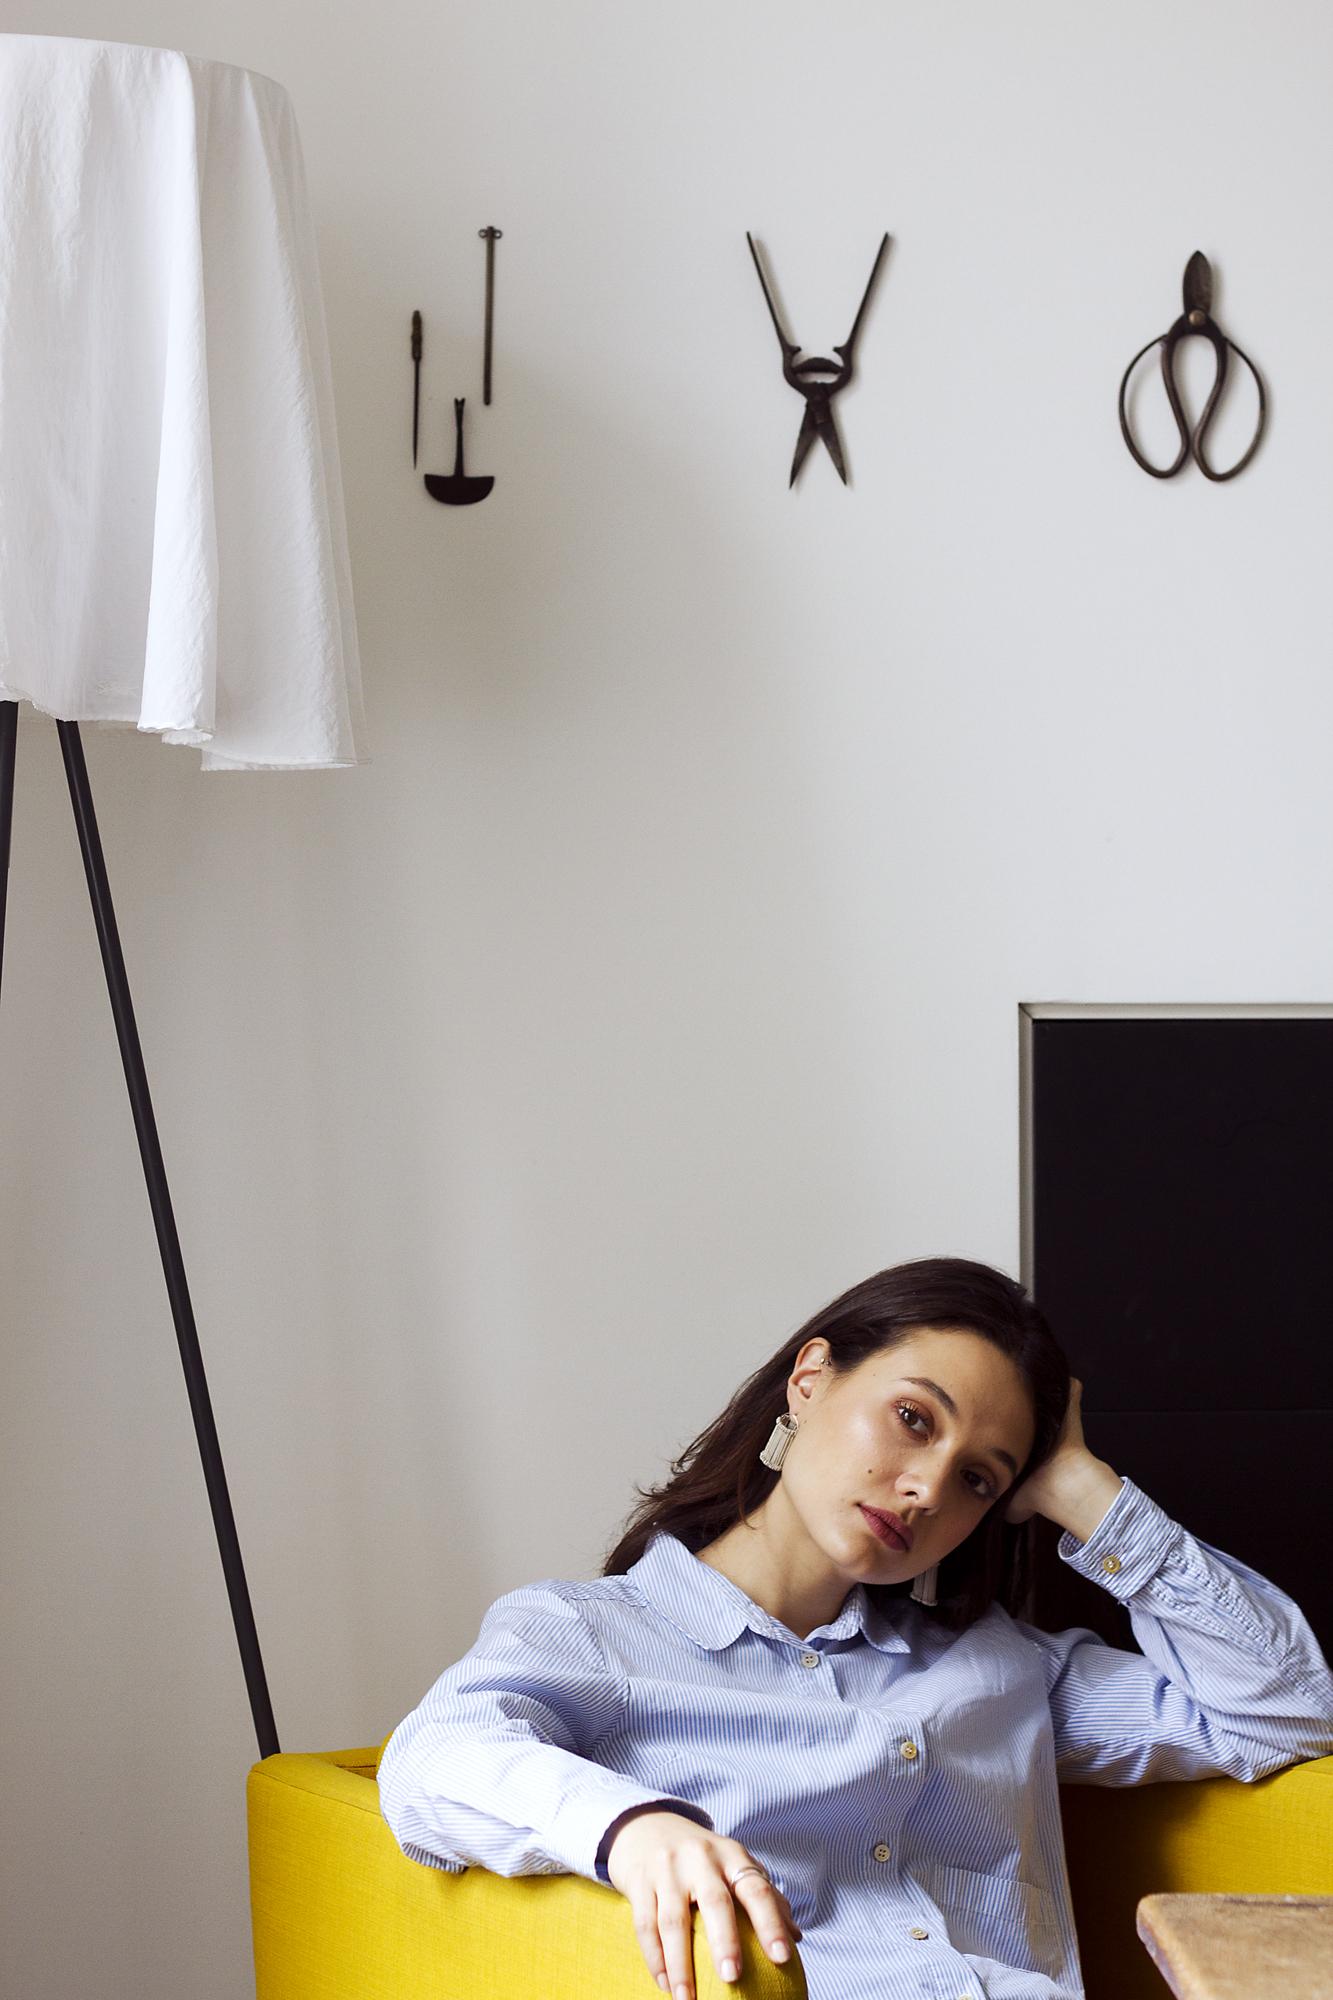 HEDDLE   earrings  in silver Photography -Katariina Yli-Malmi Model - Chiara Biscontin MUA - Shelley Yadav